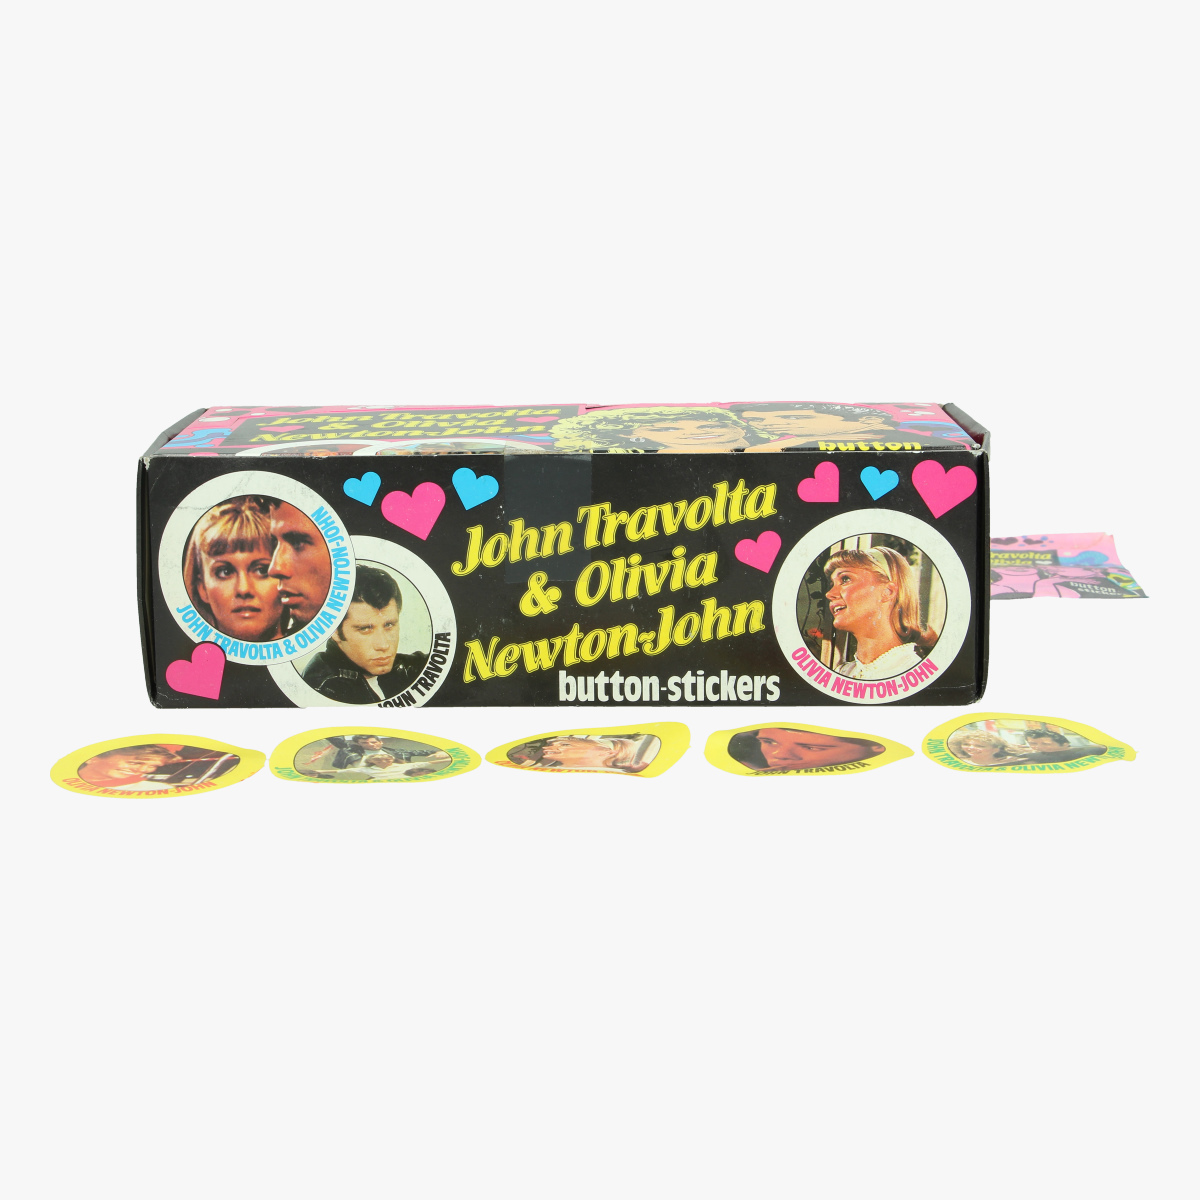 Afbeeldingen van vintage vollde doos button stickers john travolta & olivia newton-john